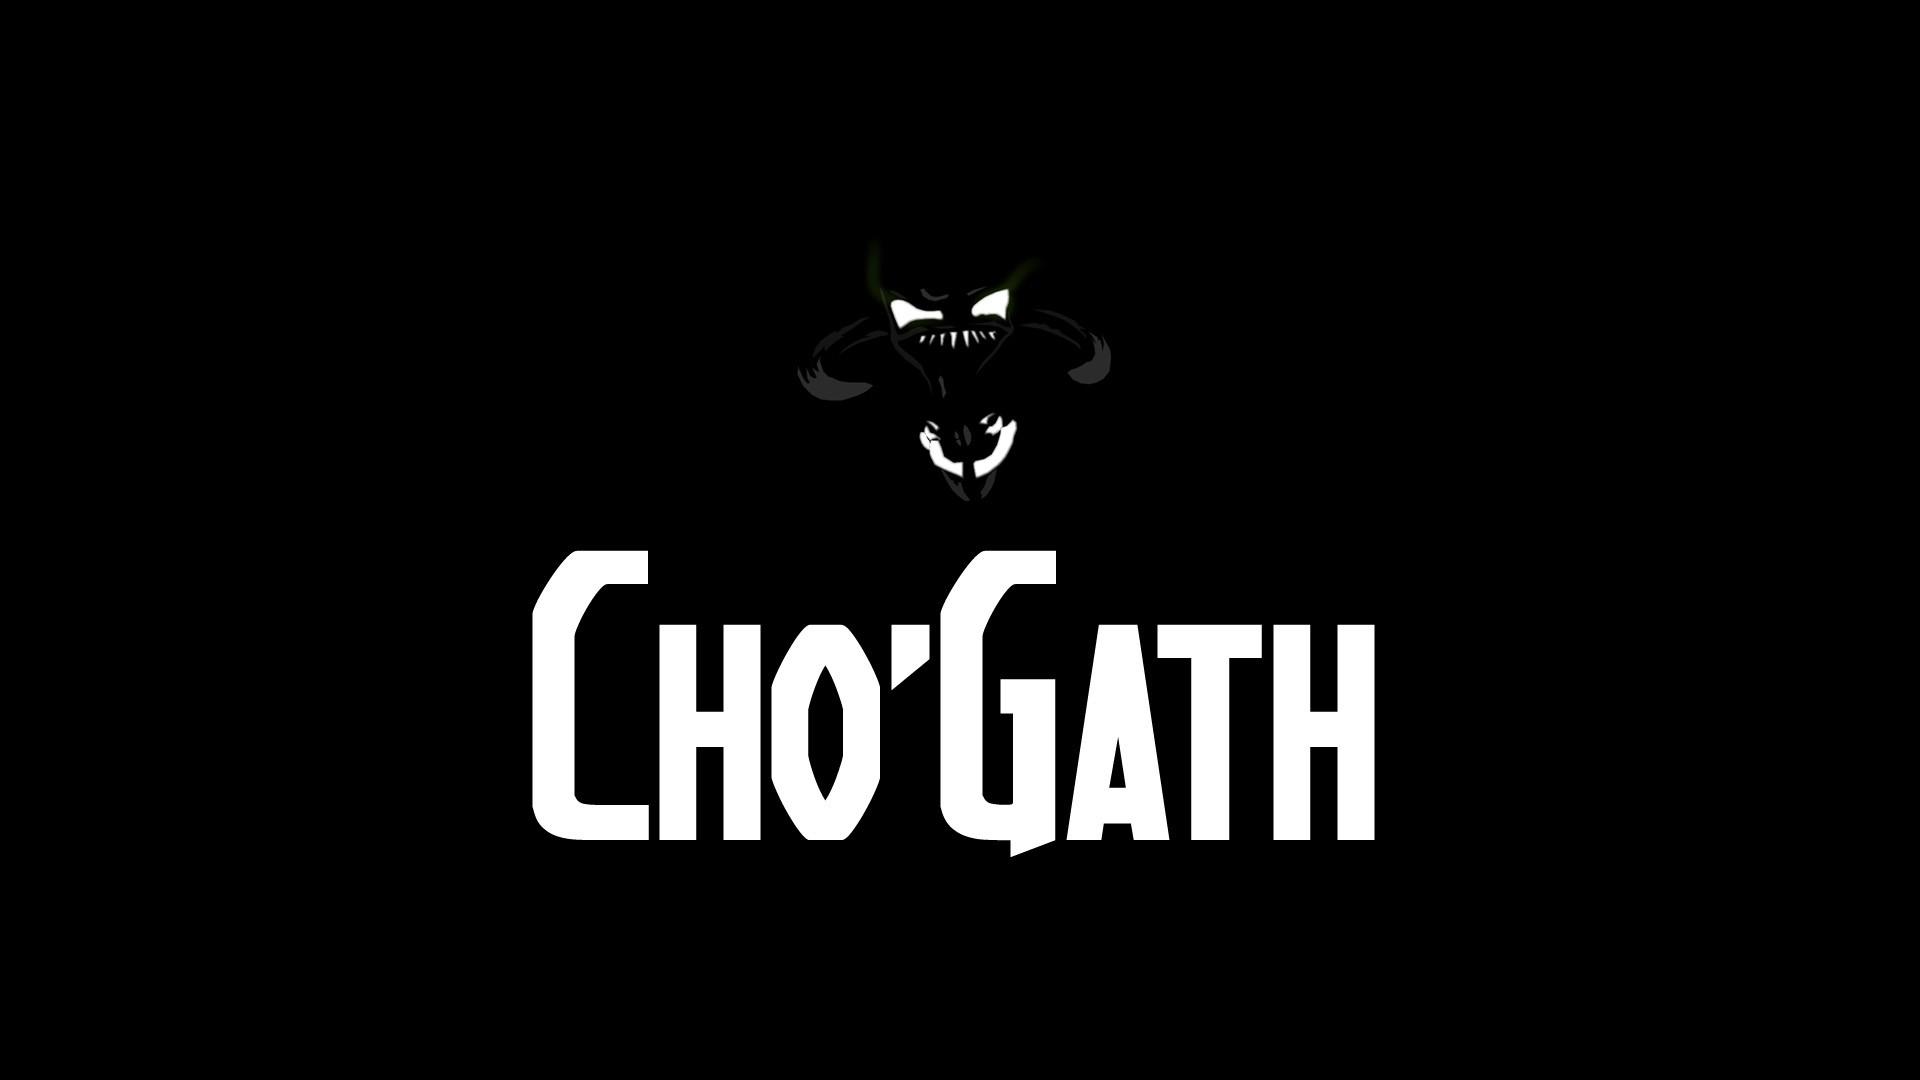 Cho'Gath wallpaper